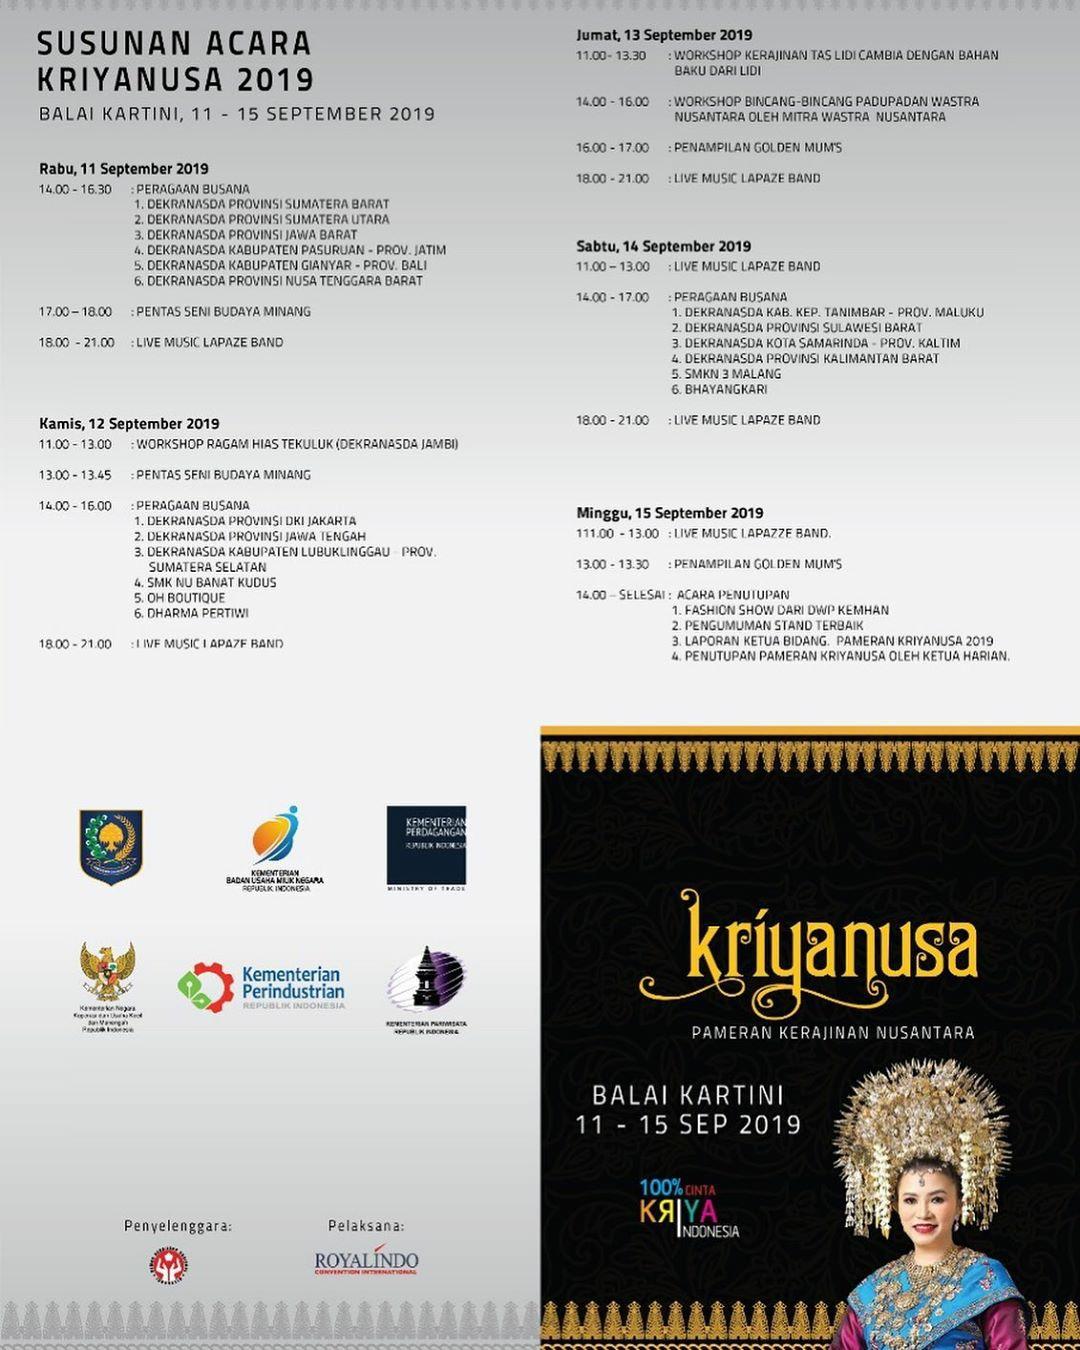 Catat! Susunan Acara Kriyanusa 2019